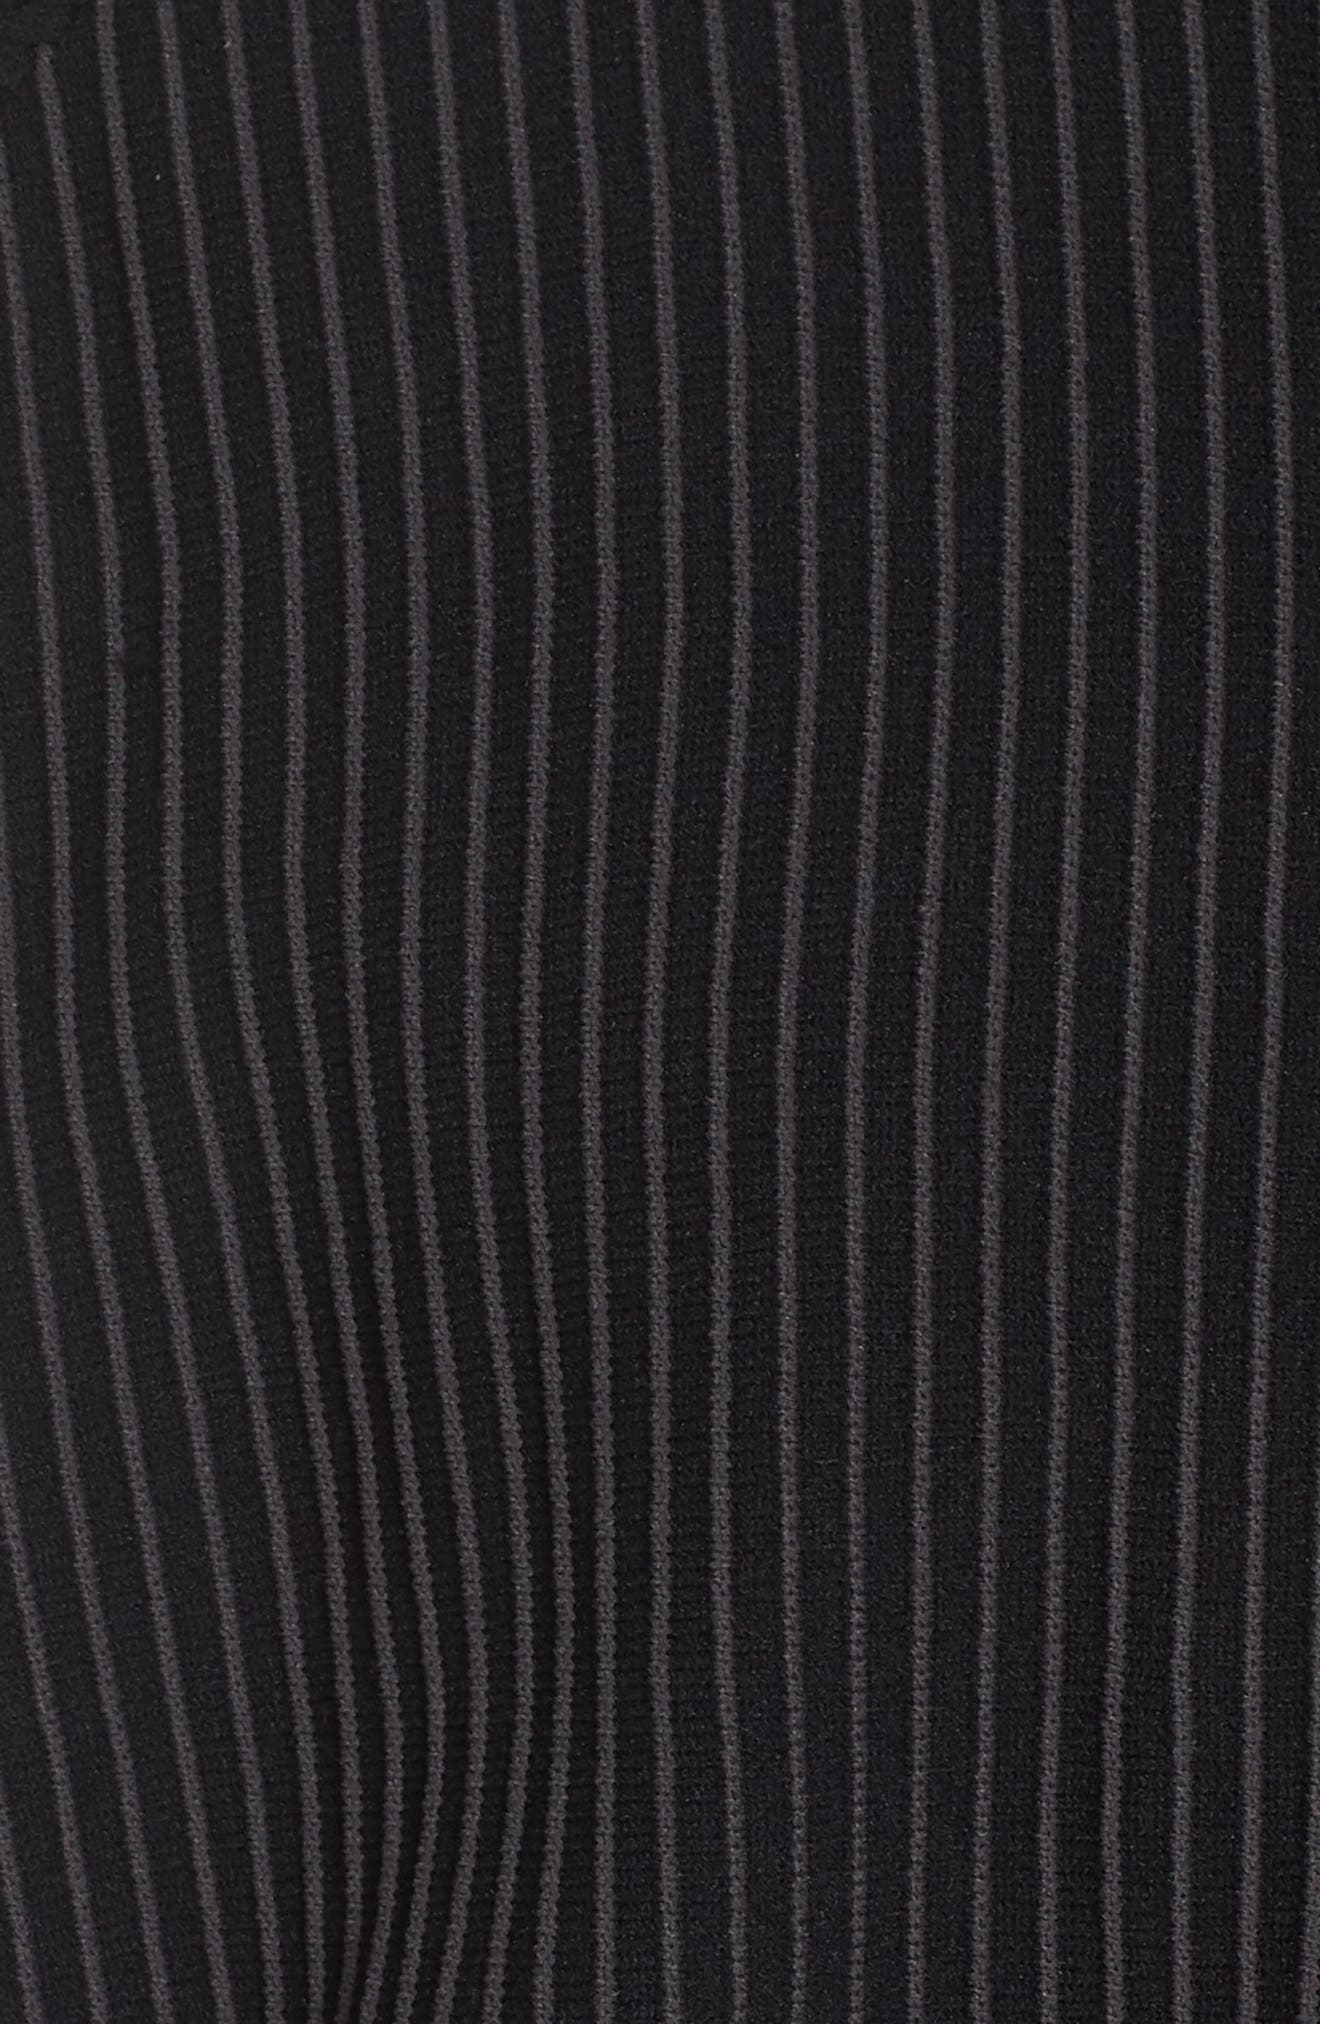 Adibreak Track Jacket,                             Alternate thumbnail 6, color,                             BLACK